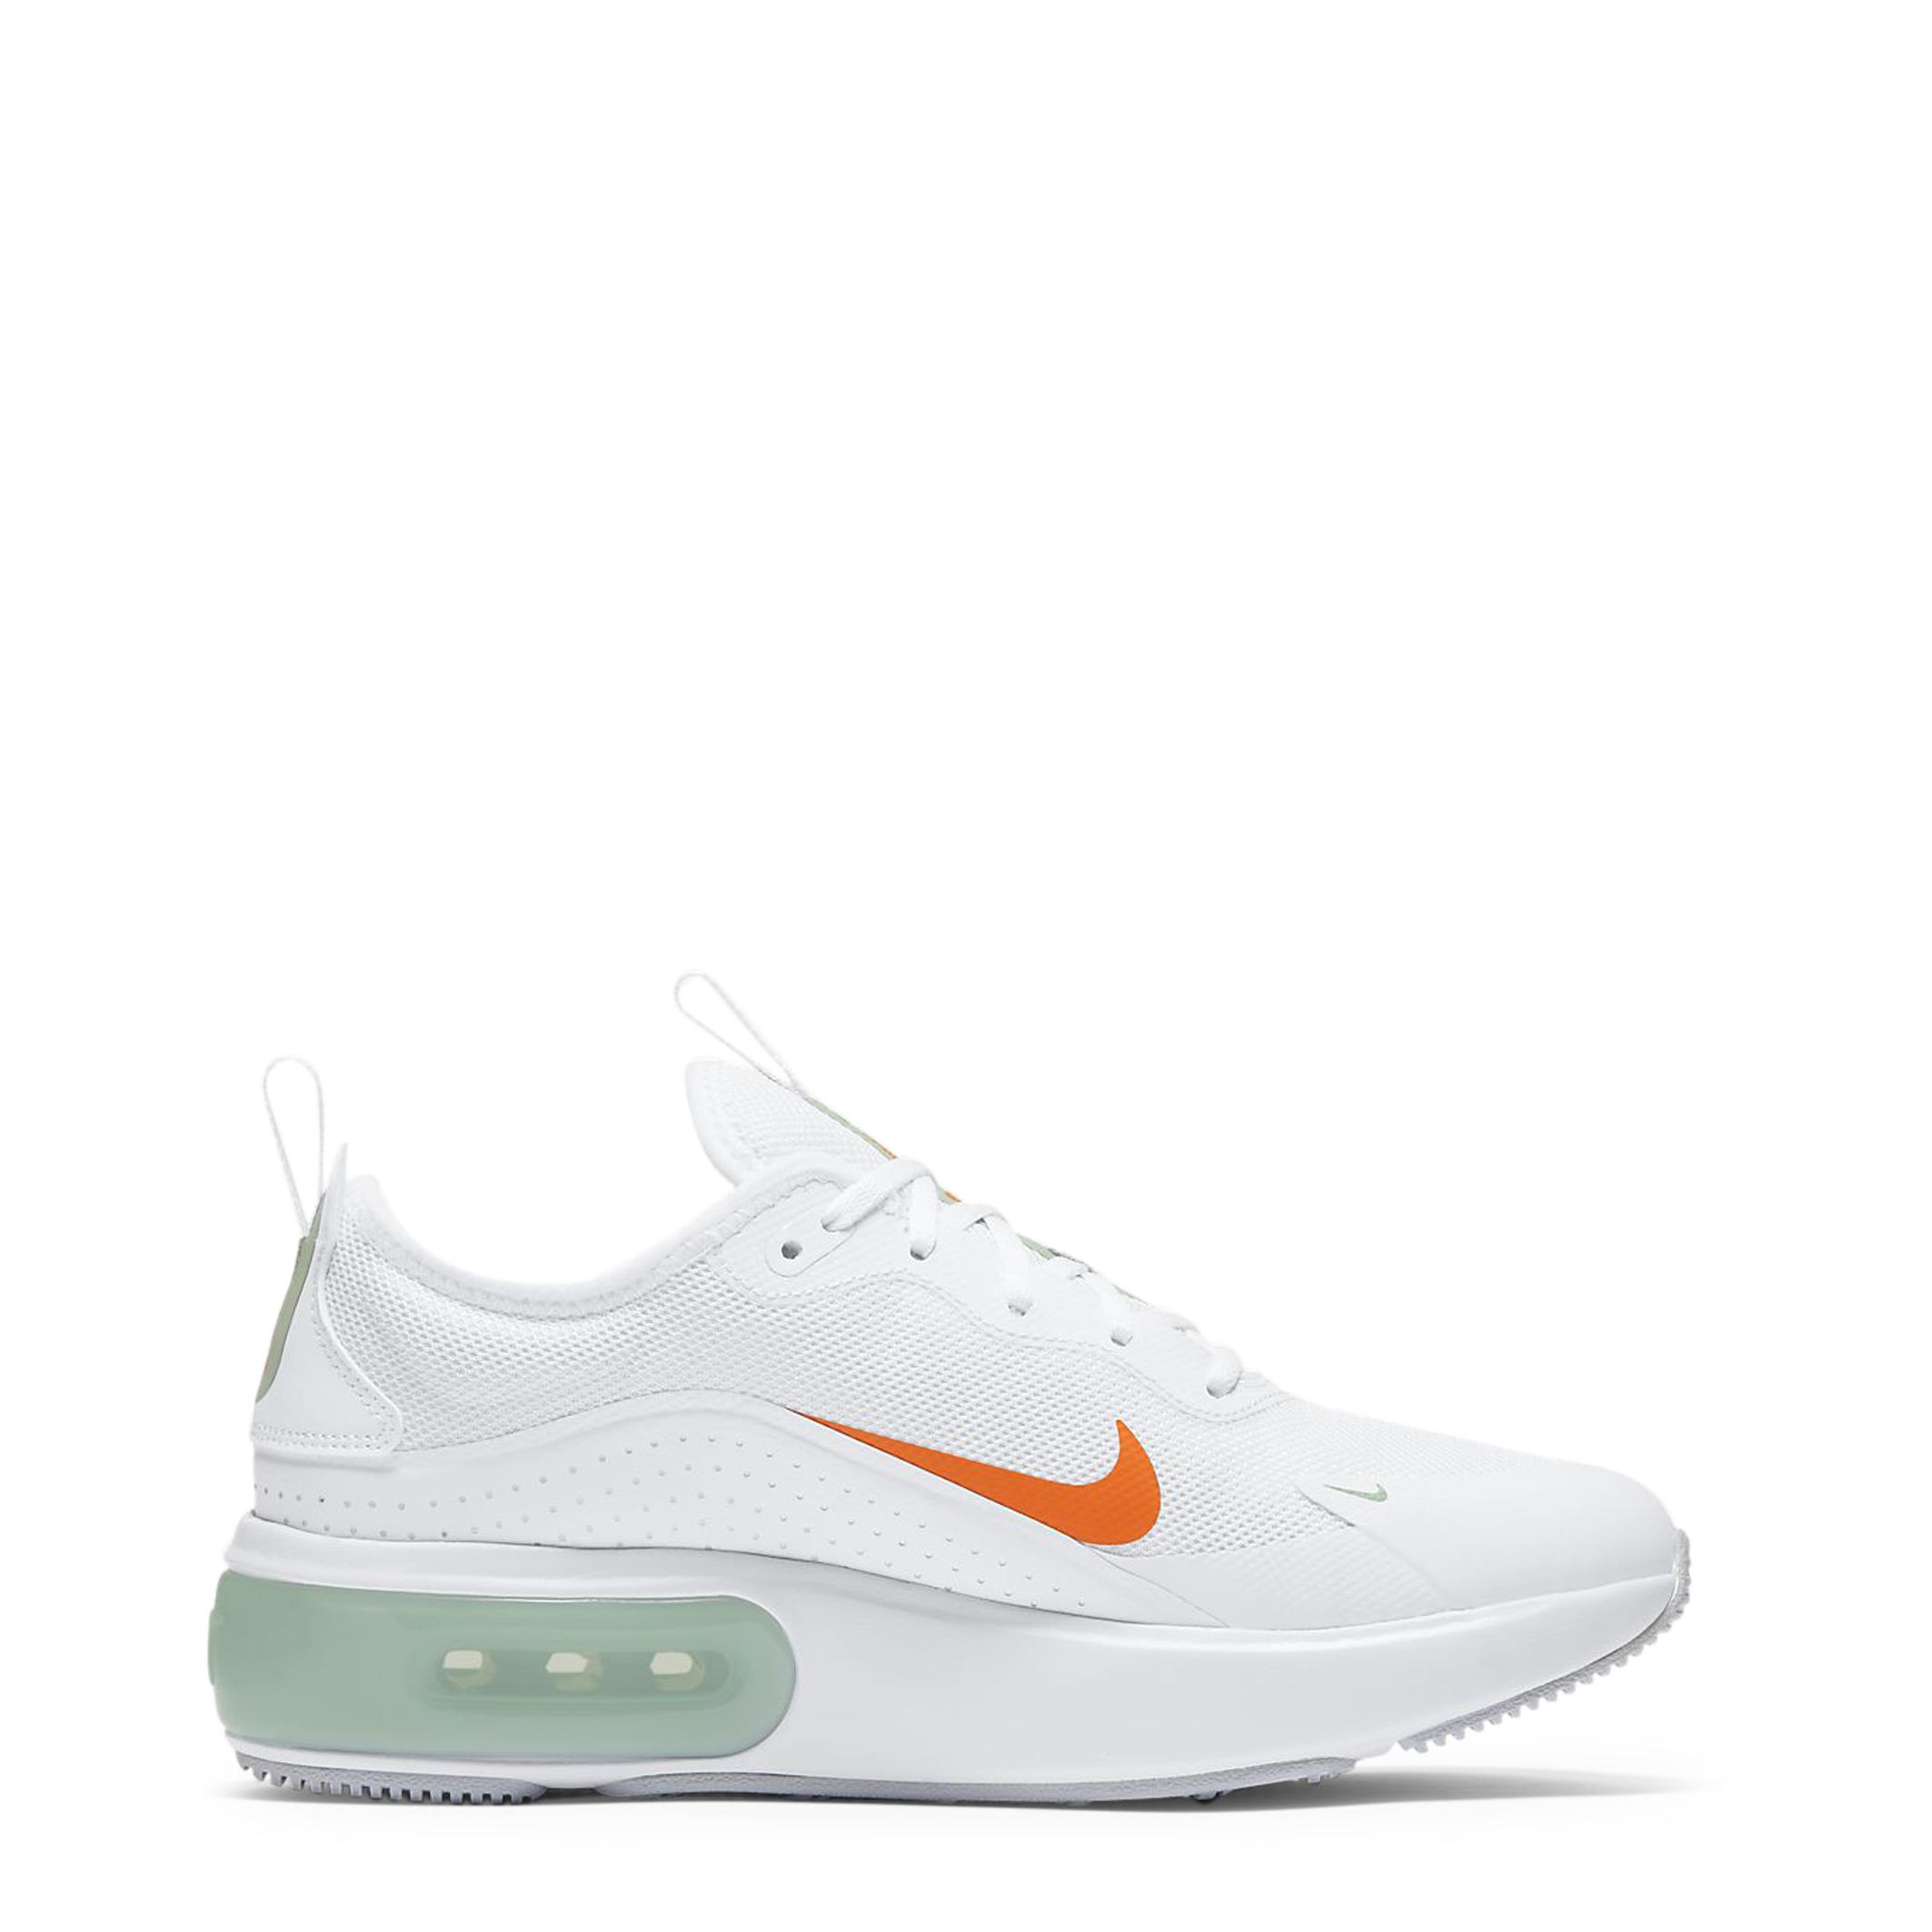 Nike AirMaxDi